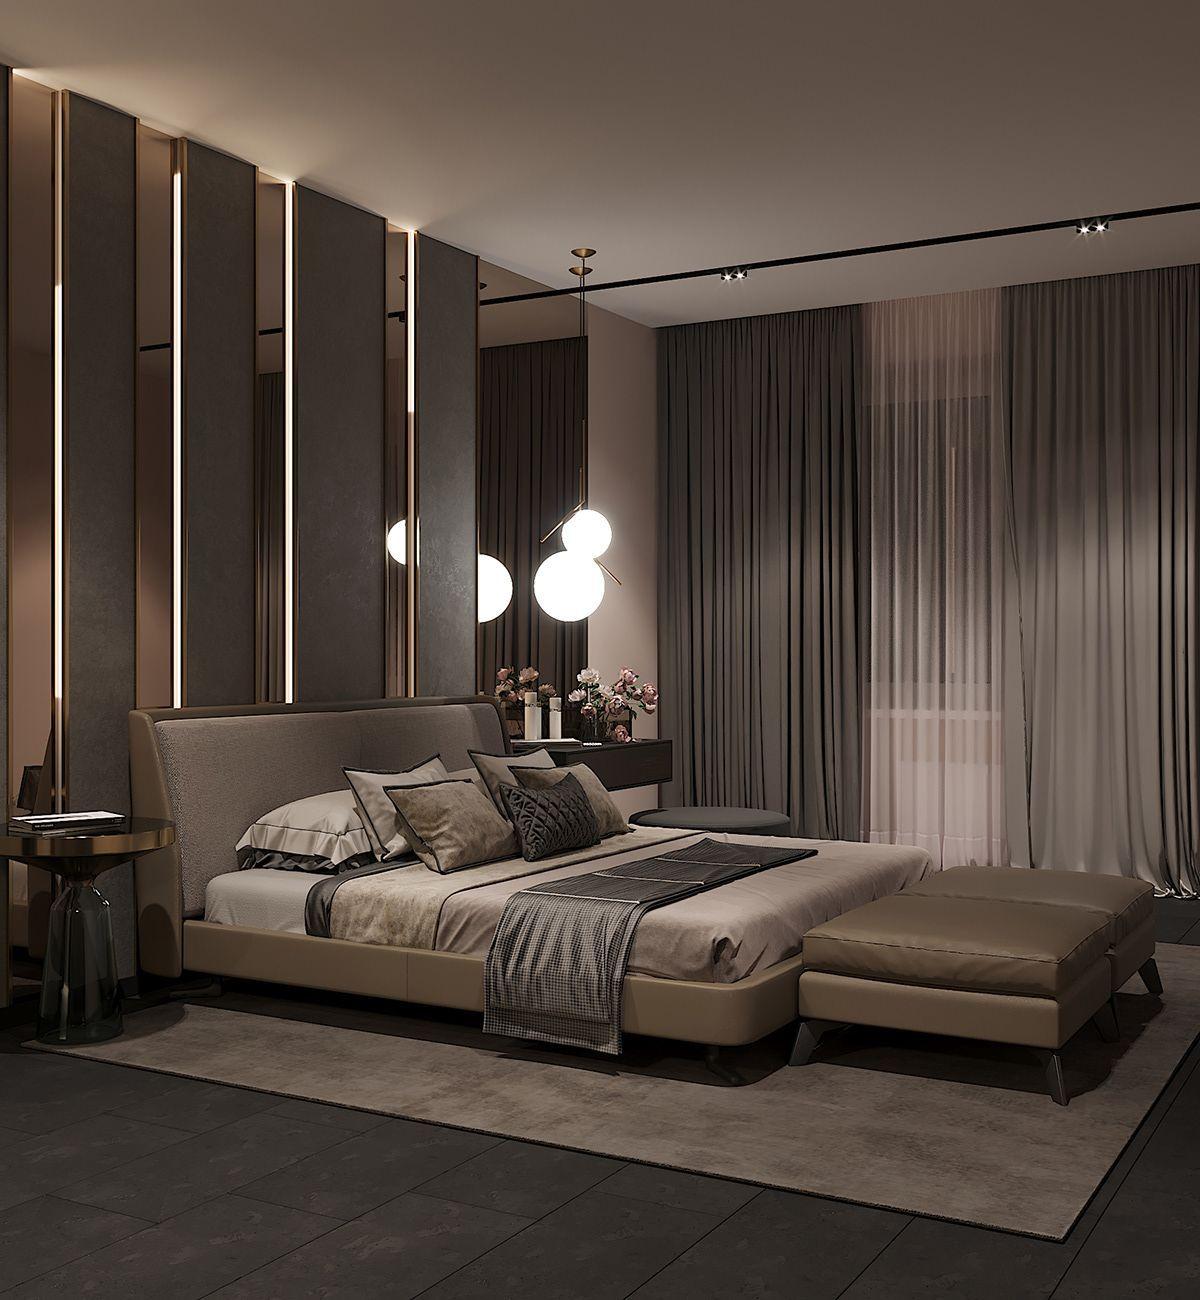 Luxurycontemporarybedrooms